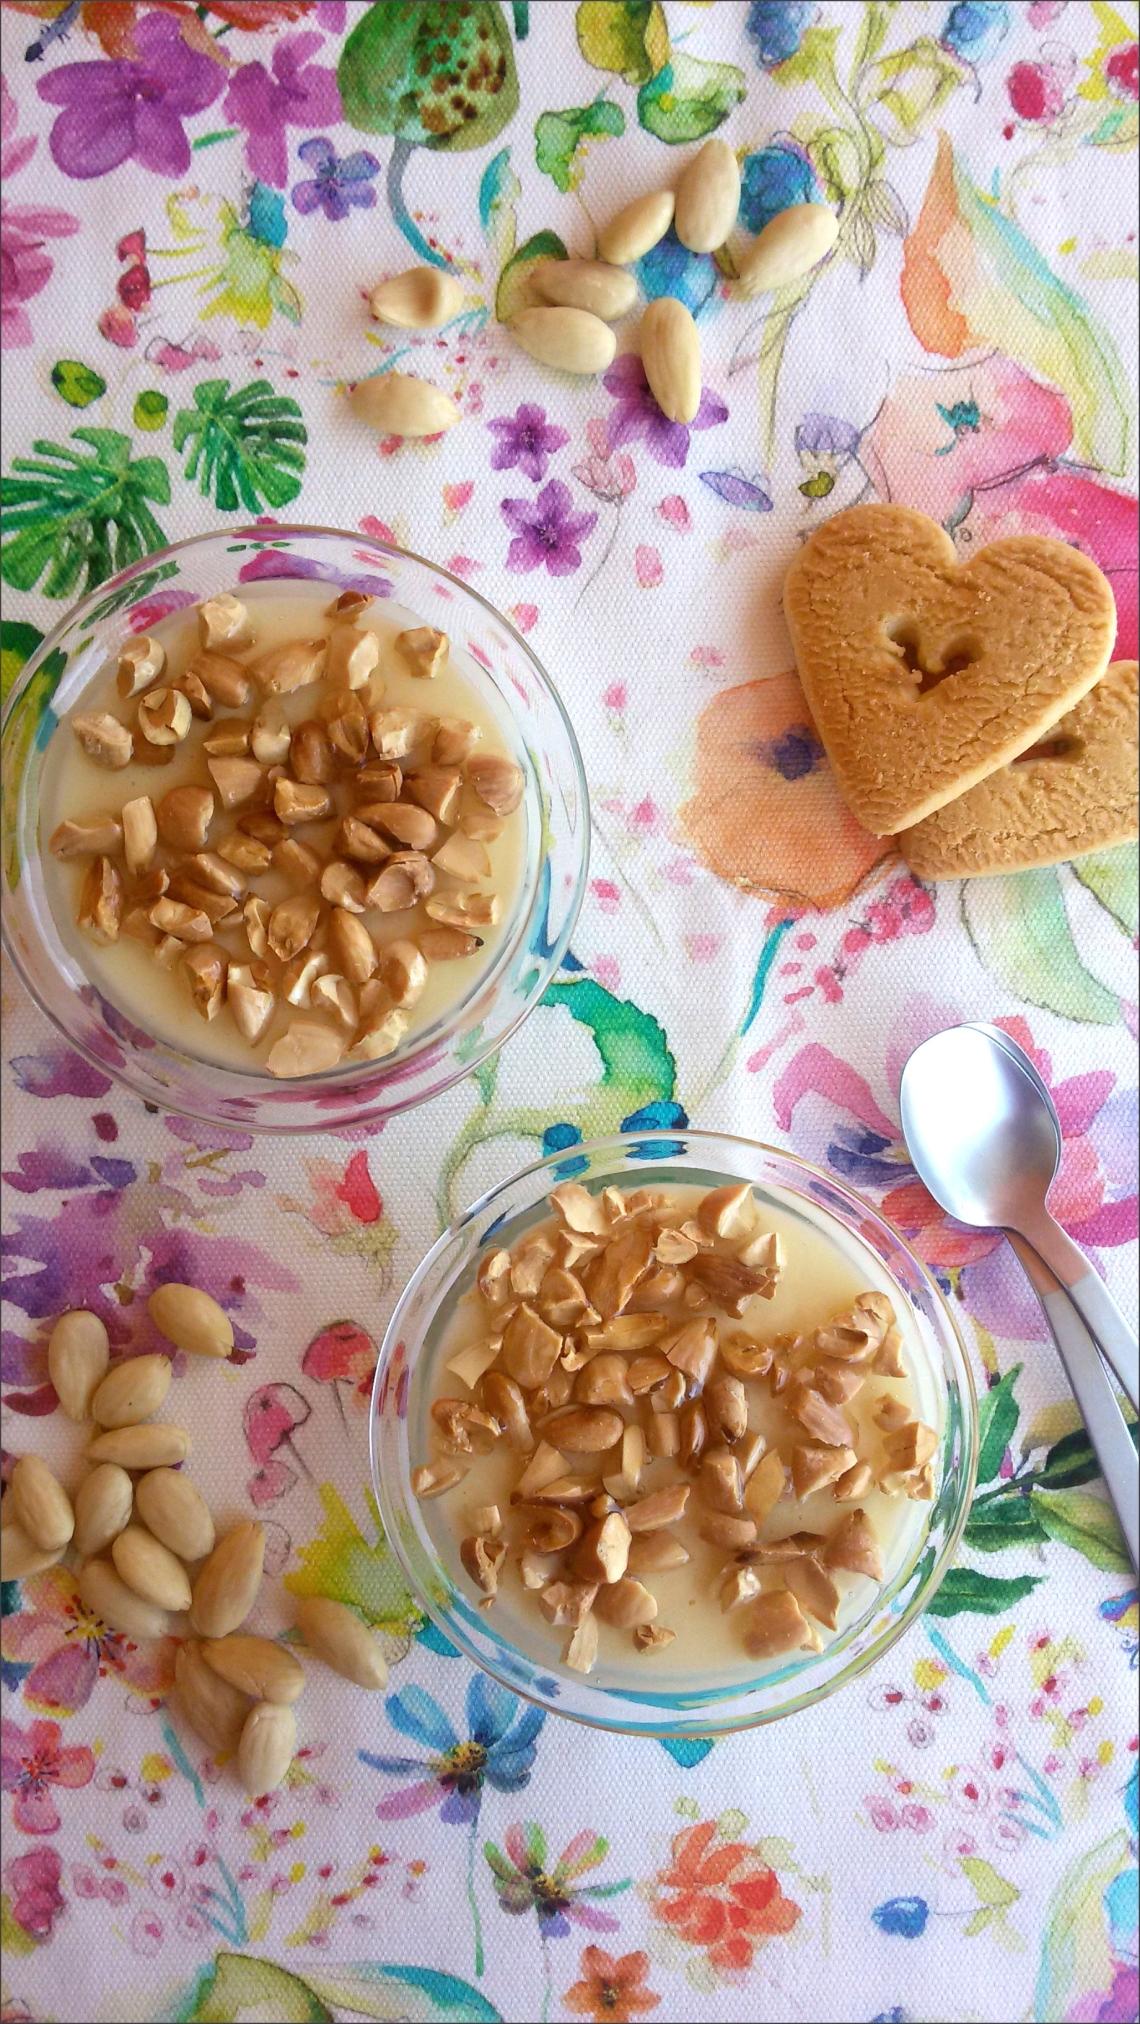 Panna-cotta-allo-yogurt-con-mandorle-tostate-e-miele-di-acacia